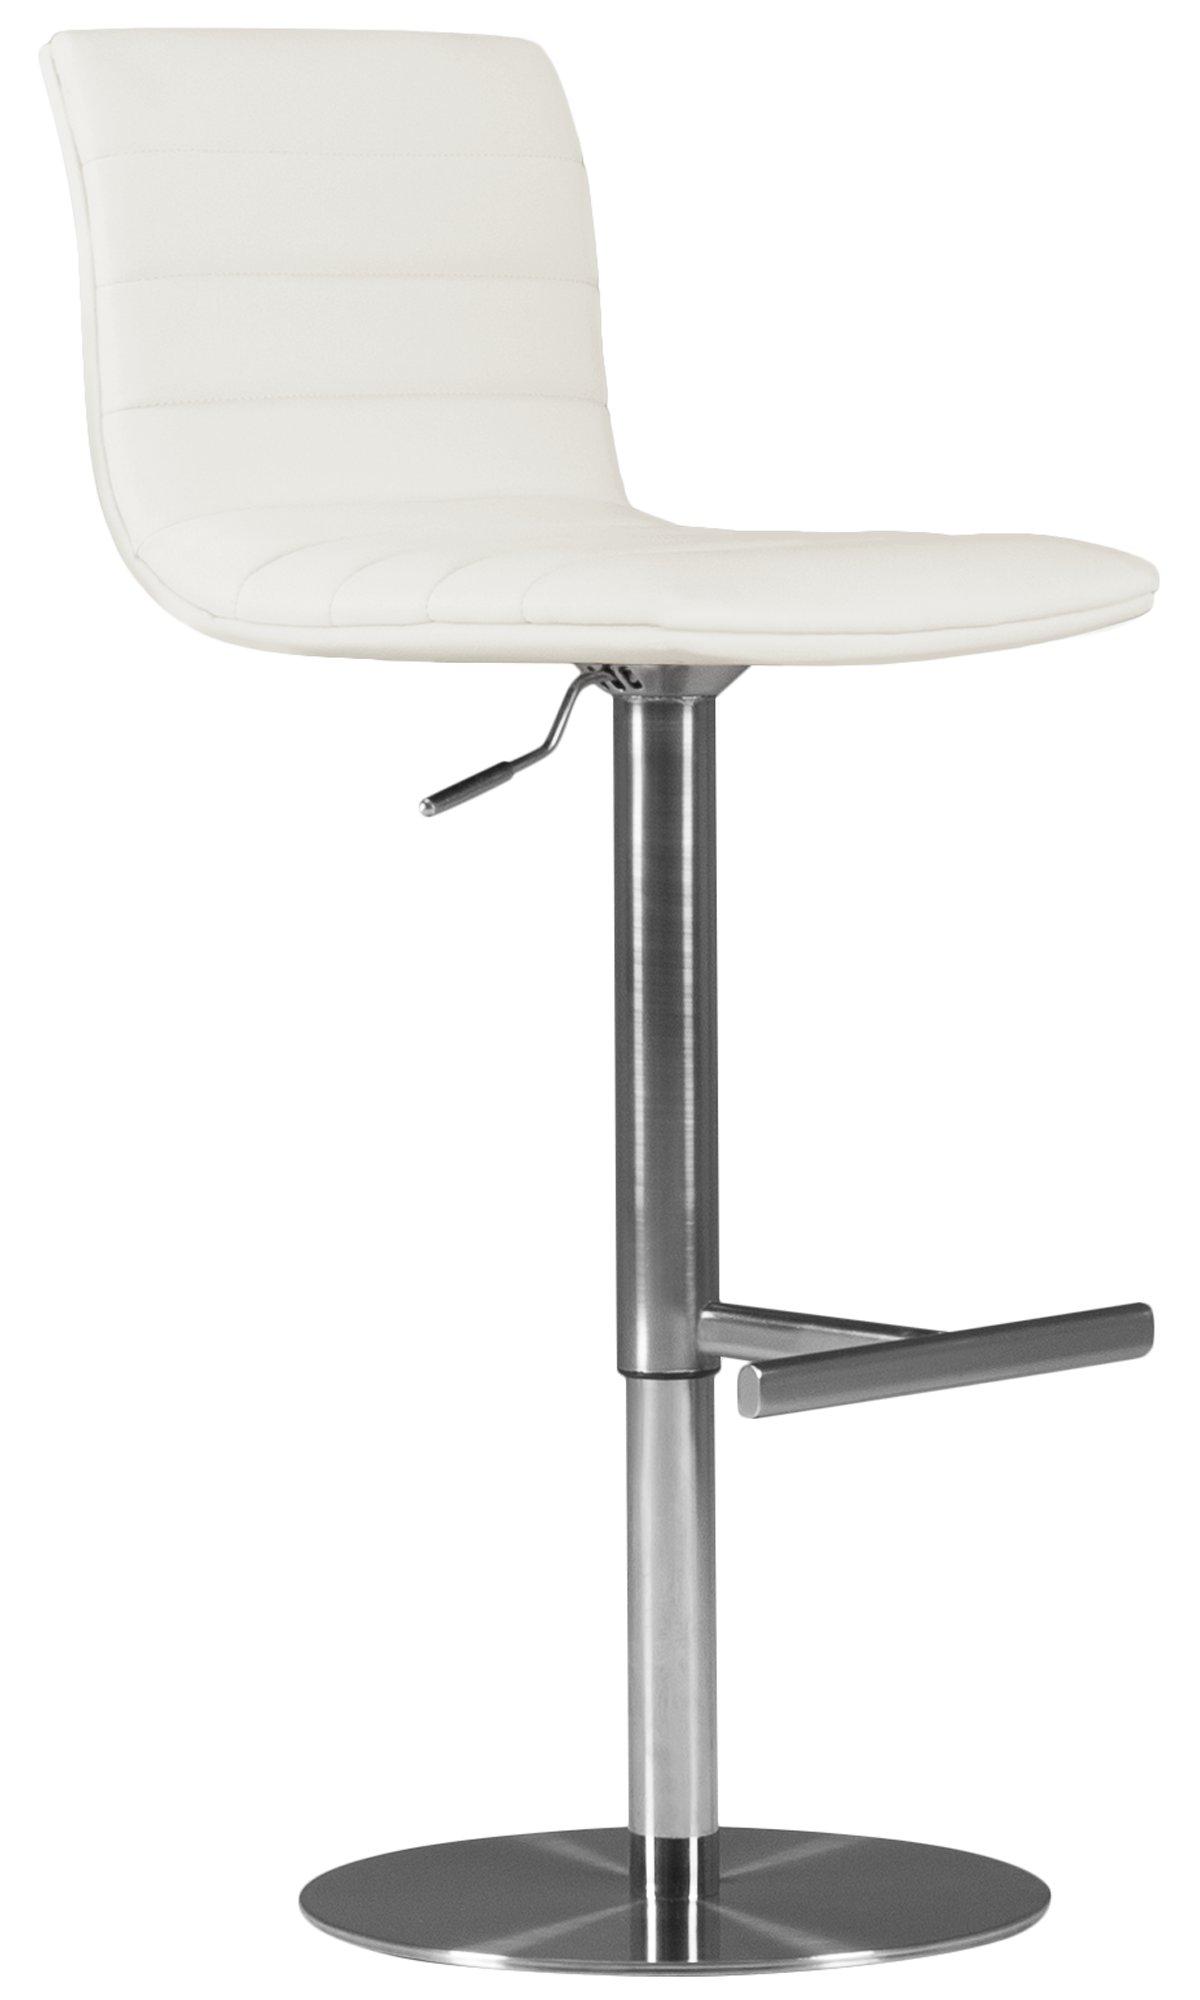 Ellis White Upholstered Adjustable Stool